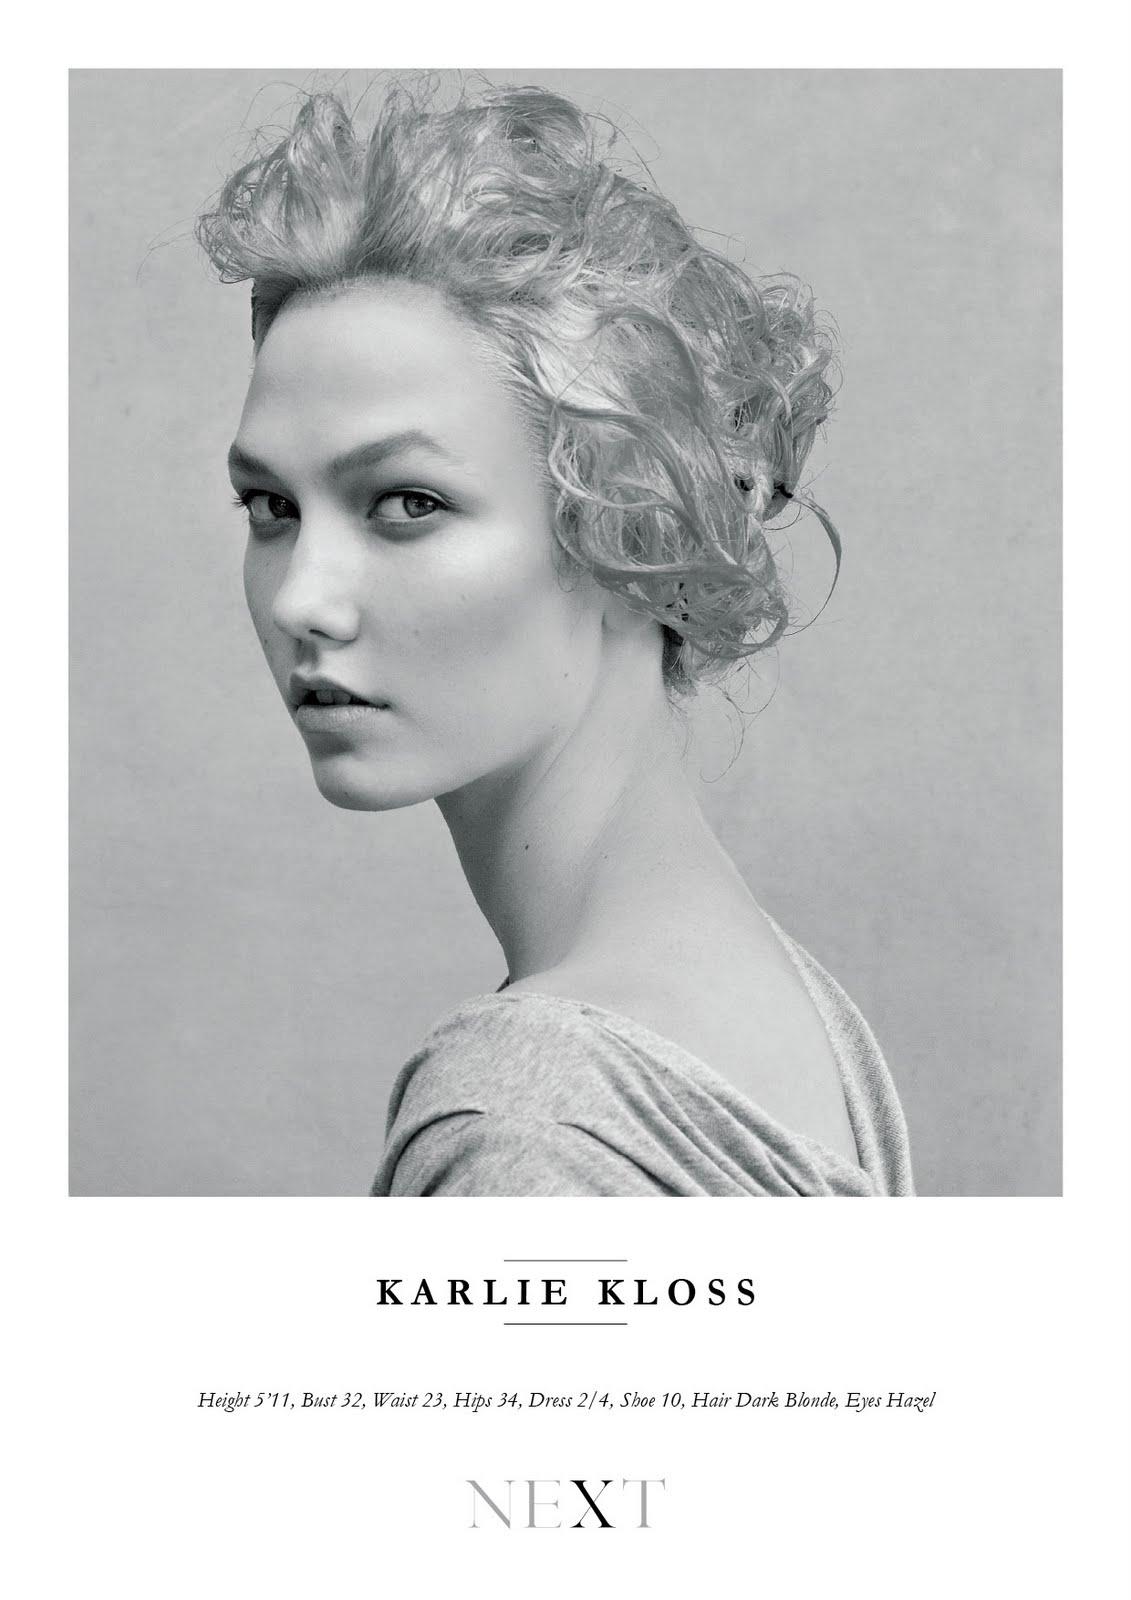 http://4.bp.blogspot.com/-wxosr0_9jQs/TgjfMb5tFCI/AAAAAAAAEjg/wwWcZTZFnME/s1600/Karlie+Kloss.jpg